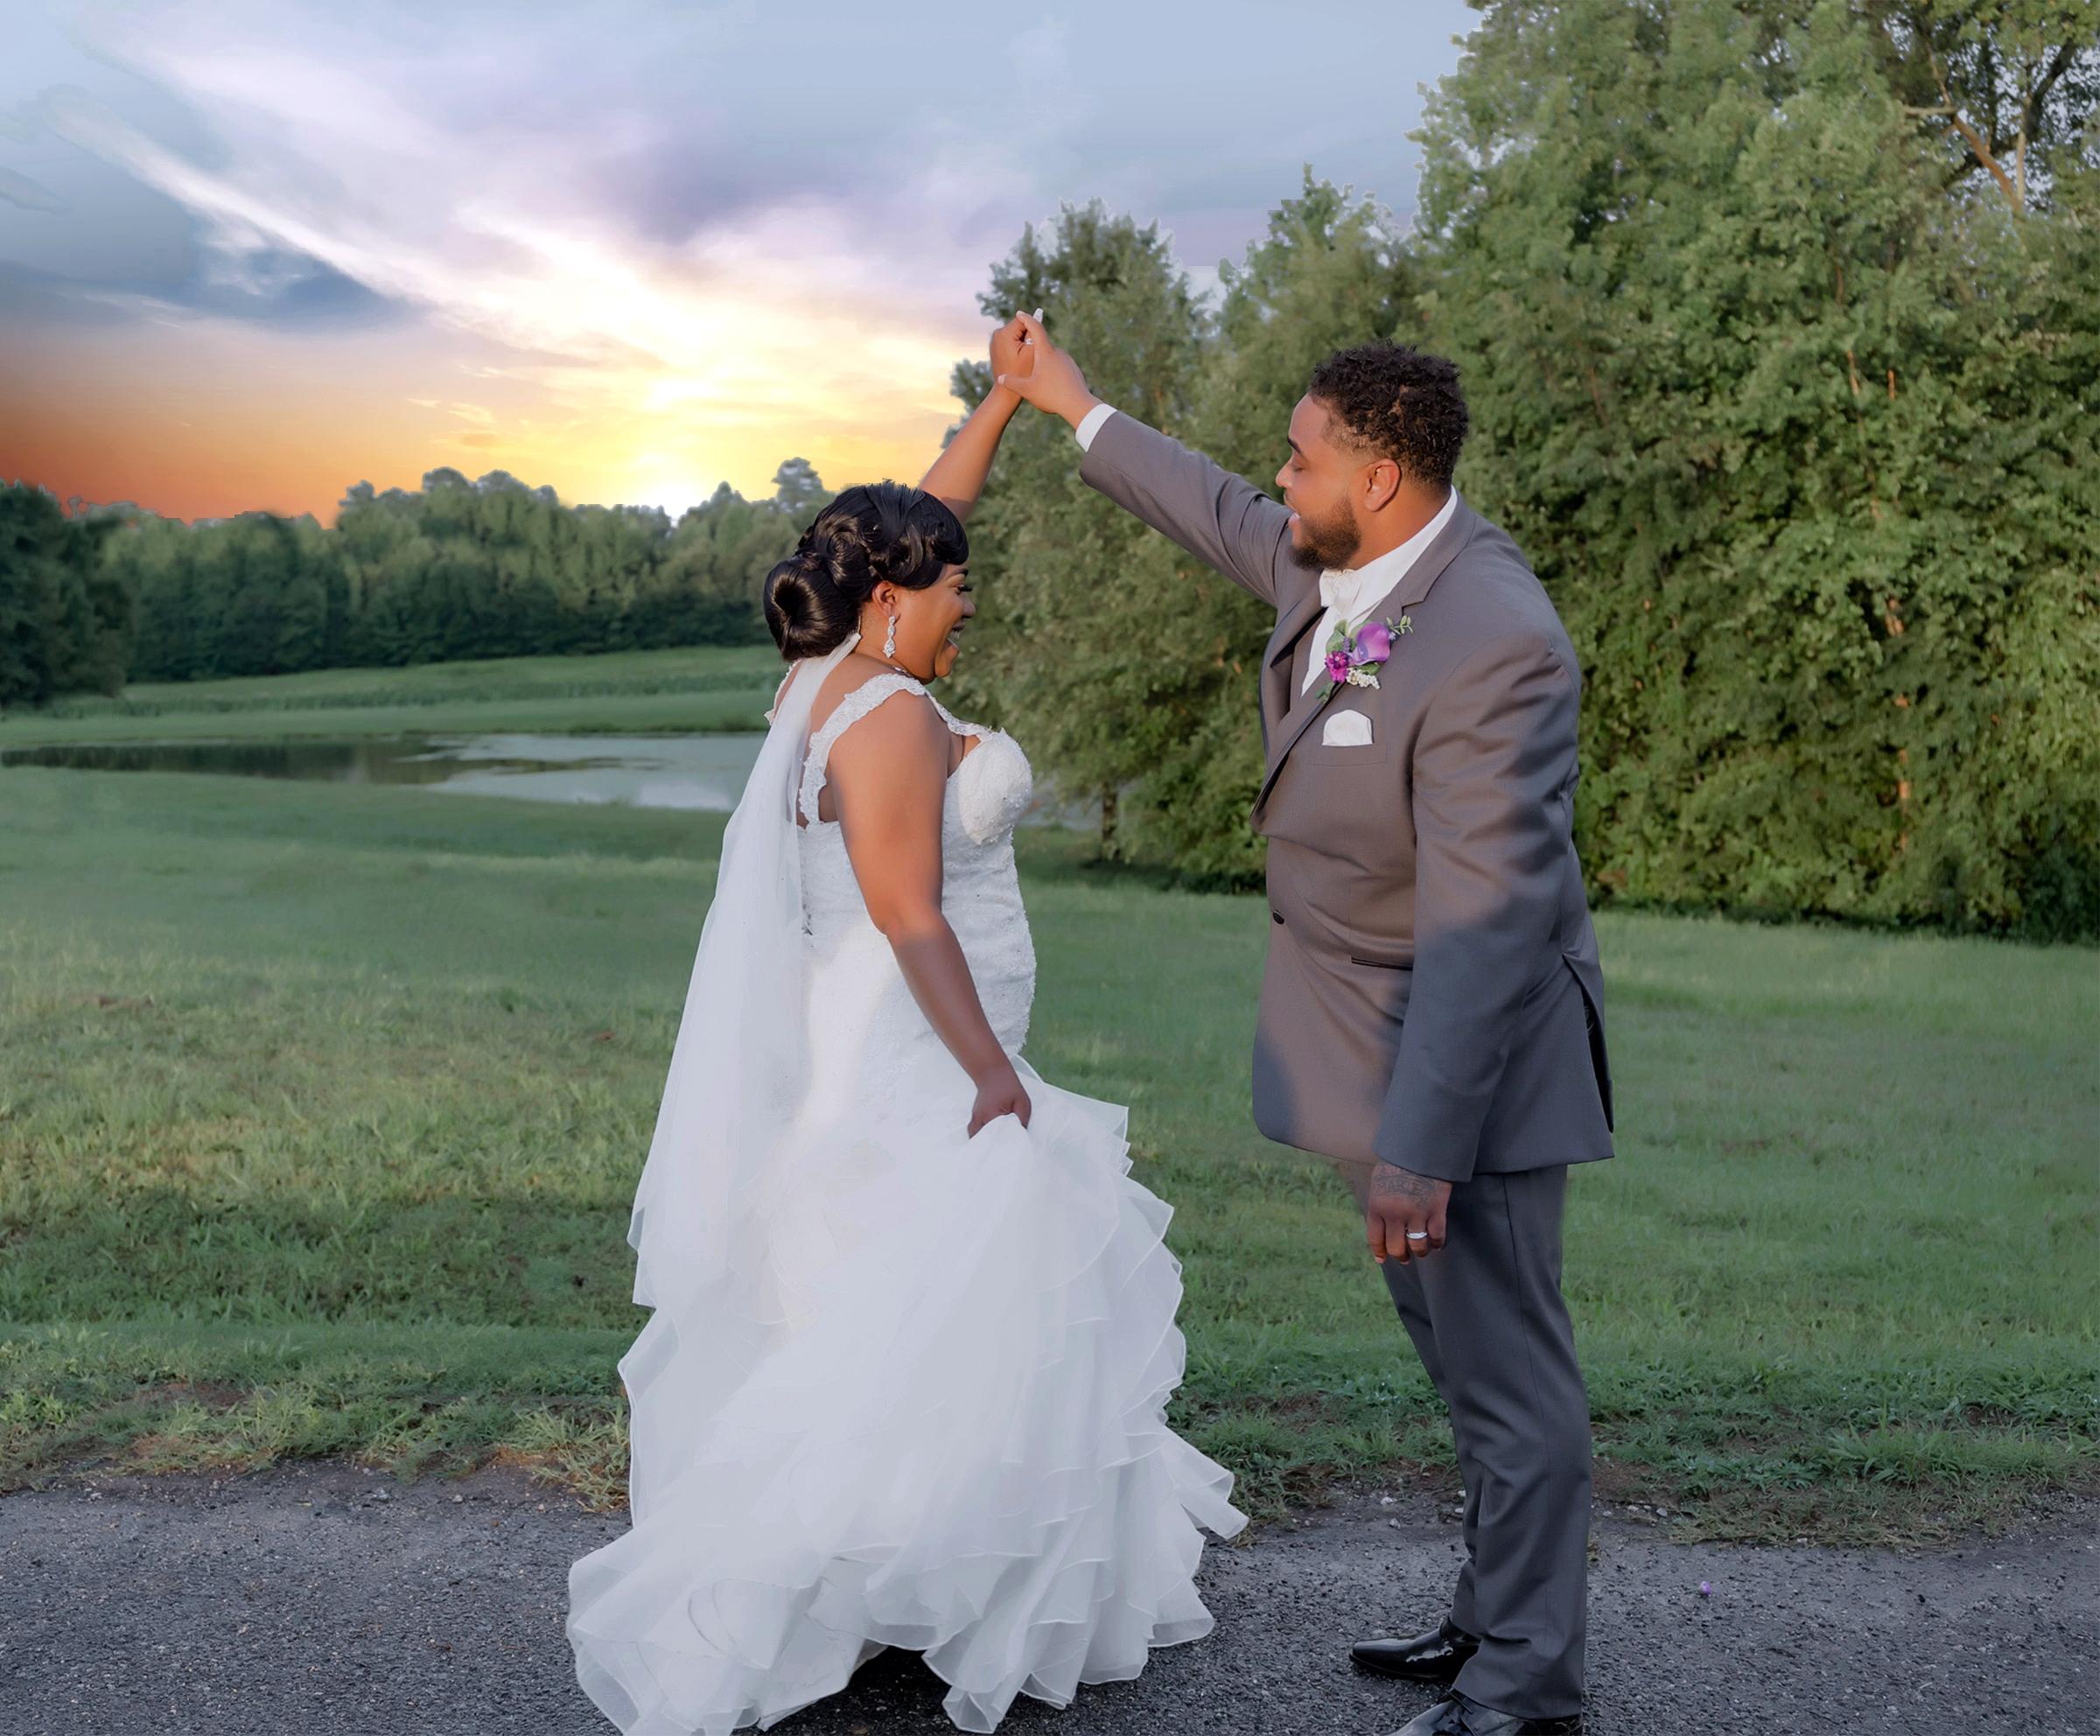 2020_Ashley_wedding_protraits_14_1